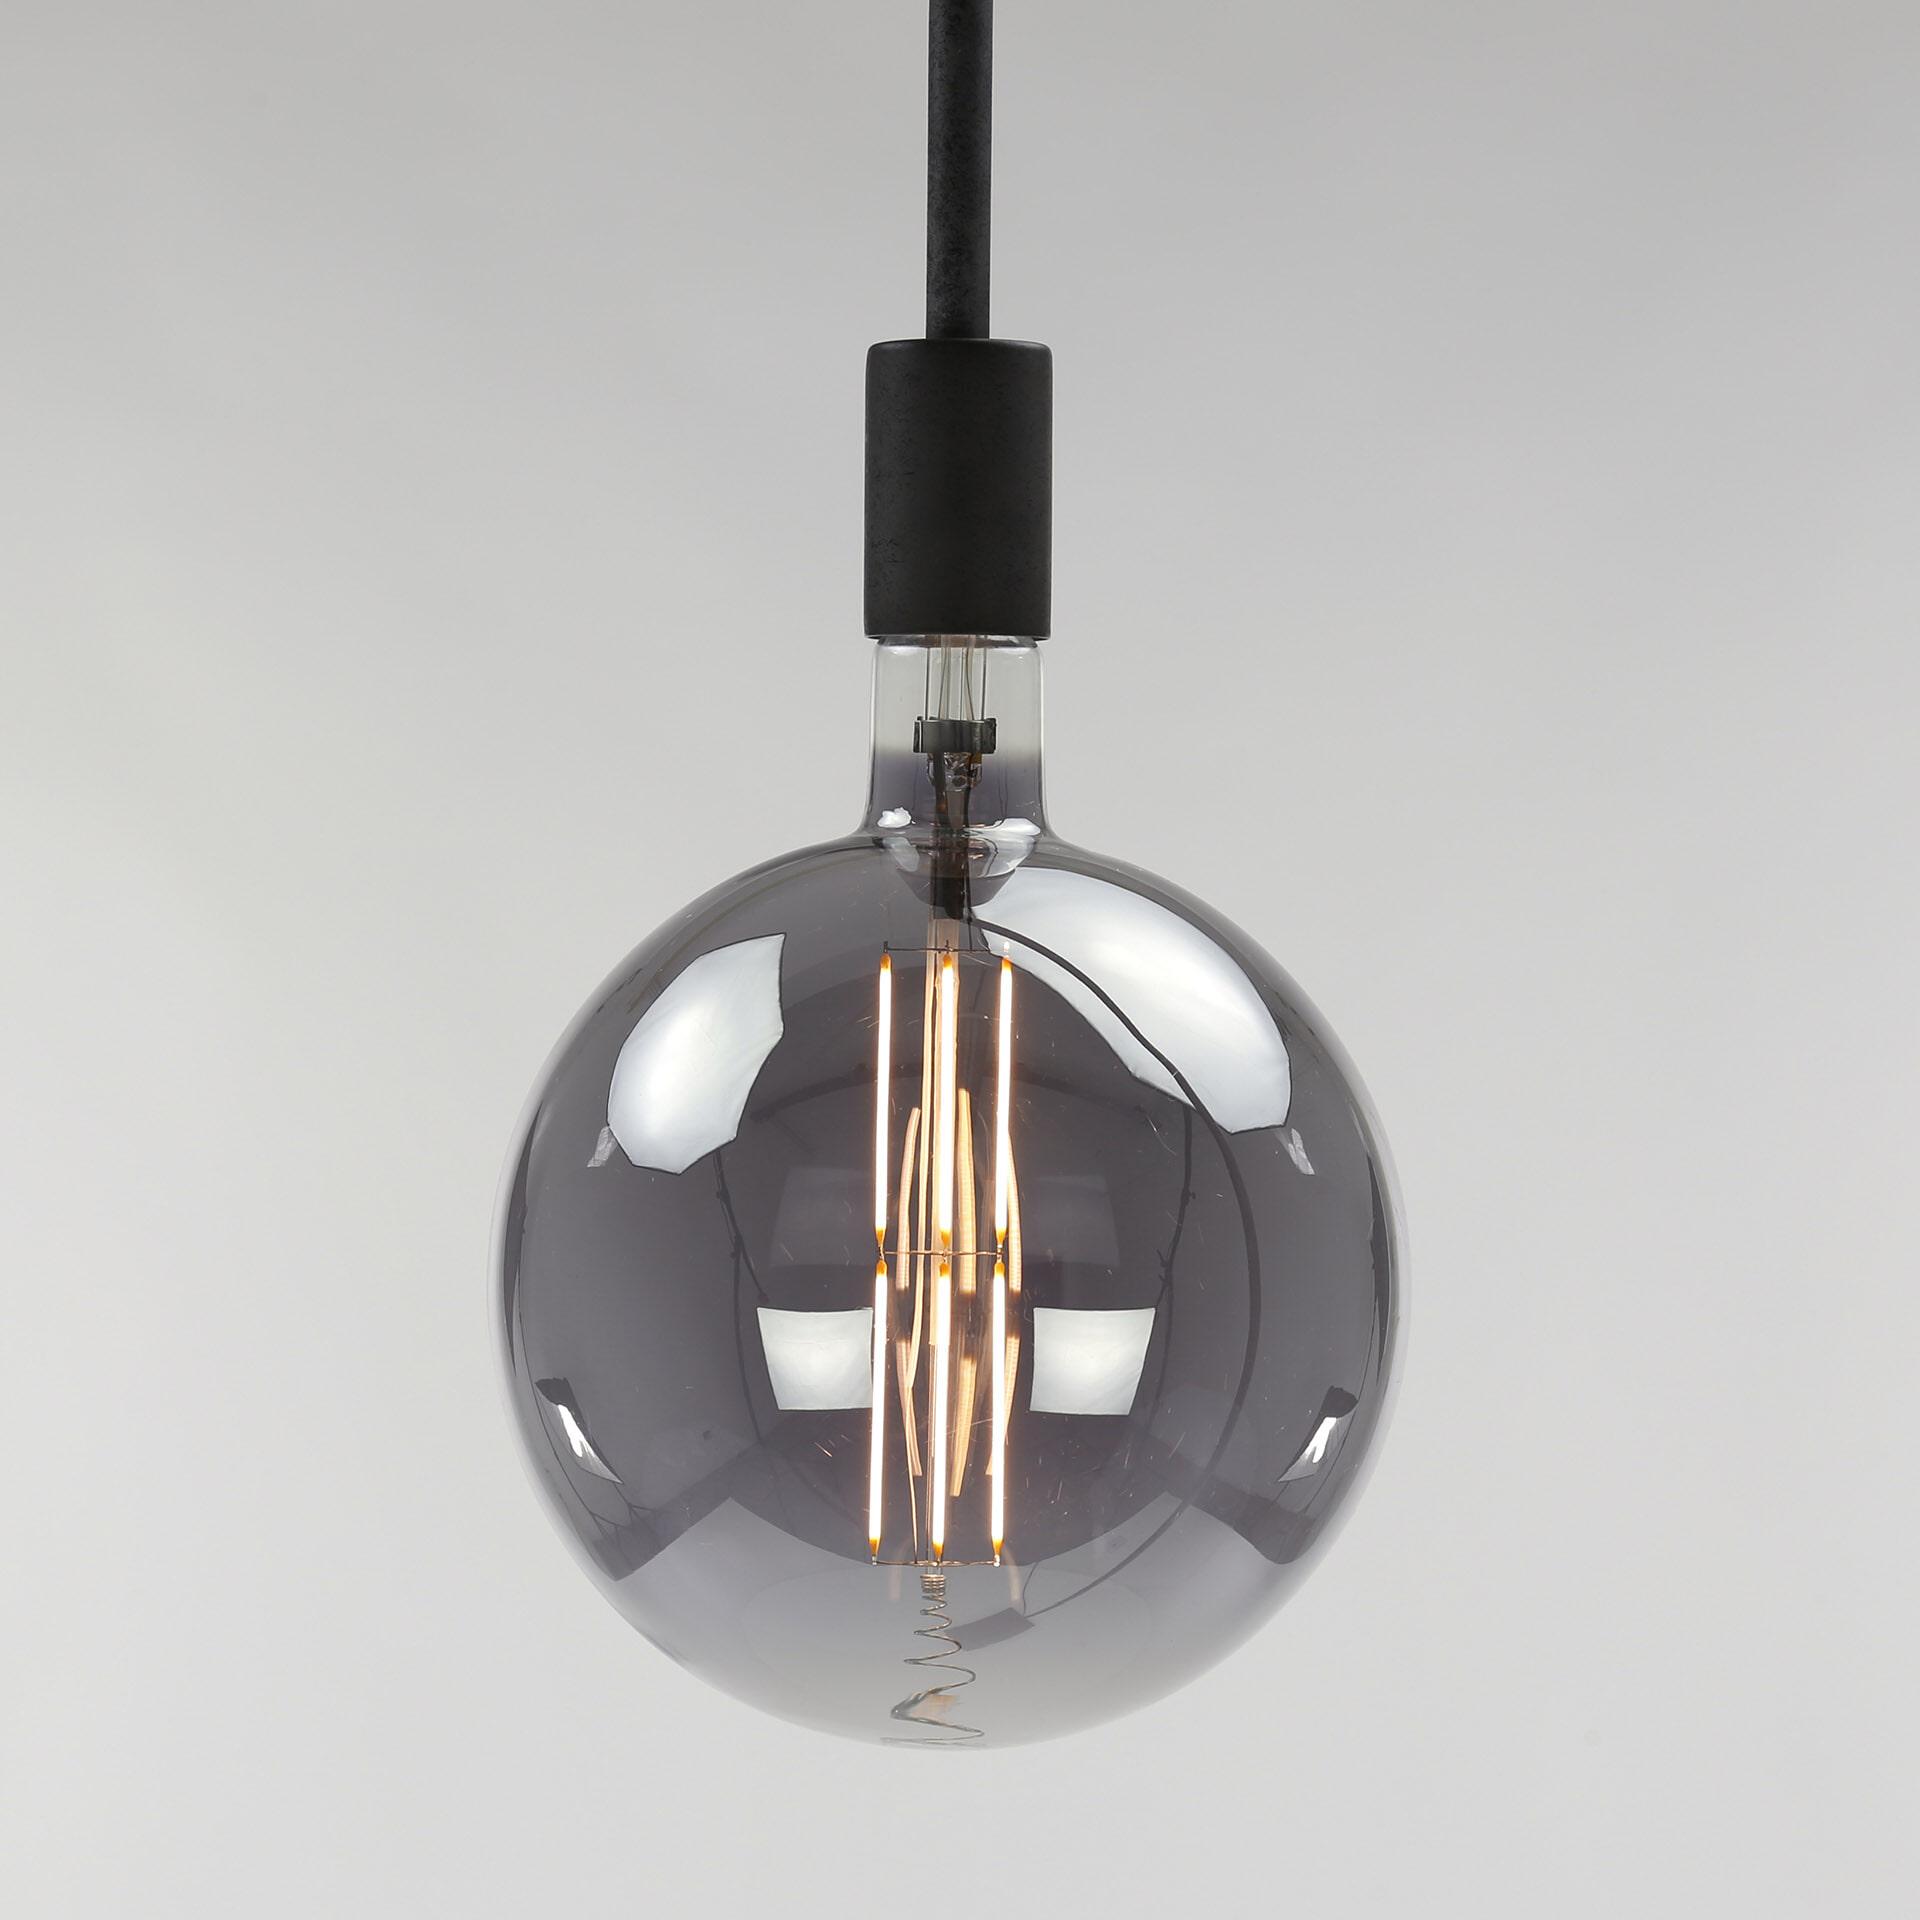 Kooldraadlamp 'Bol XXL' Ø20cm, LED E27 / 8W, Smoke grey, dimbaar